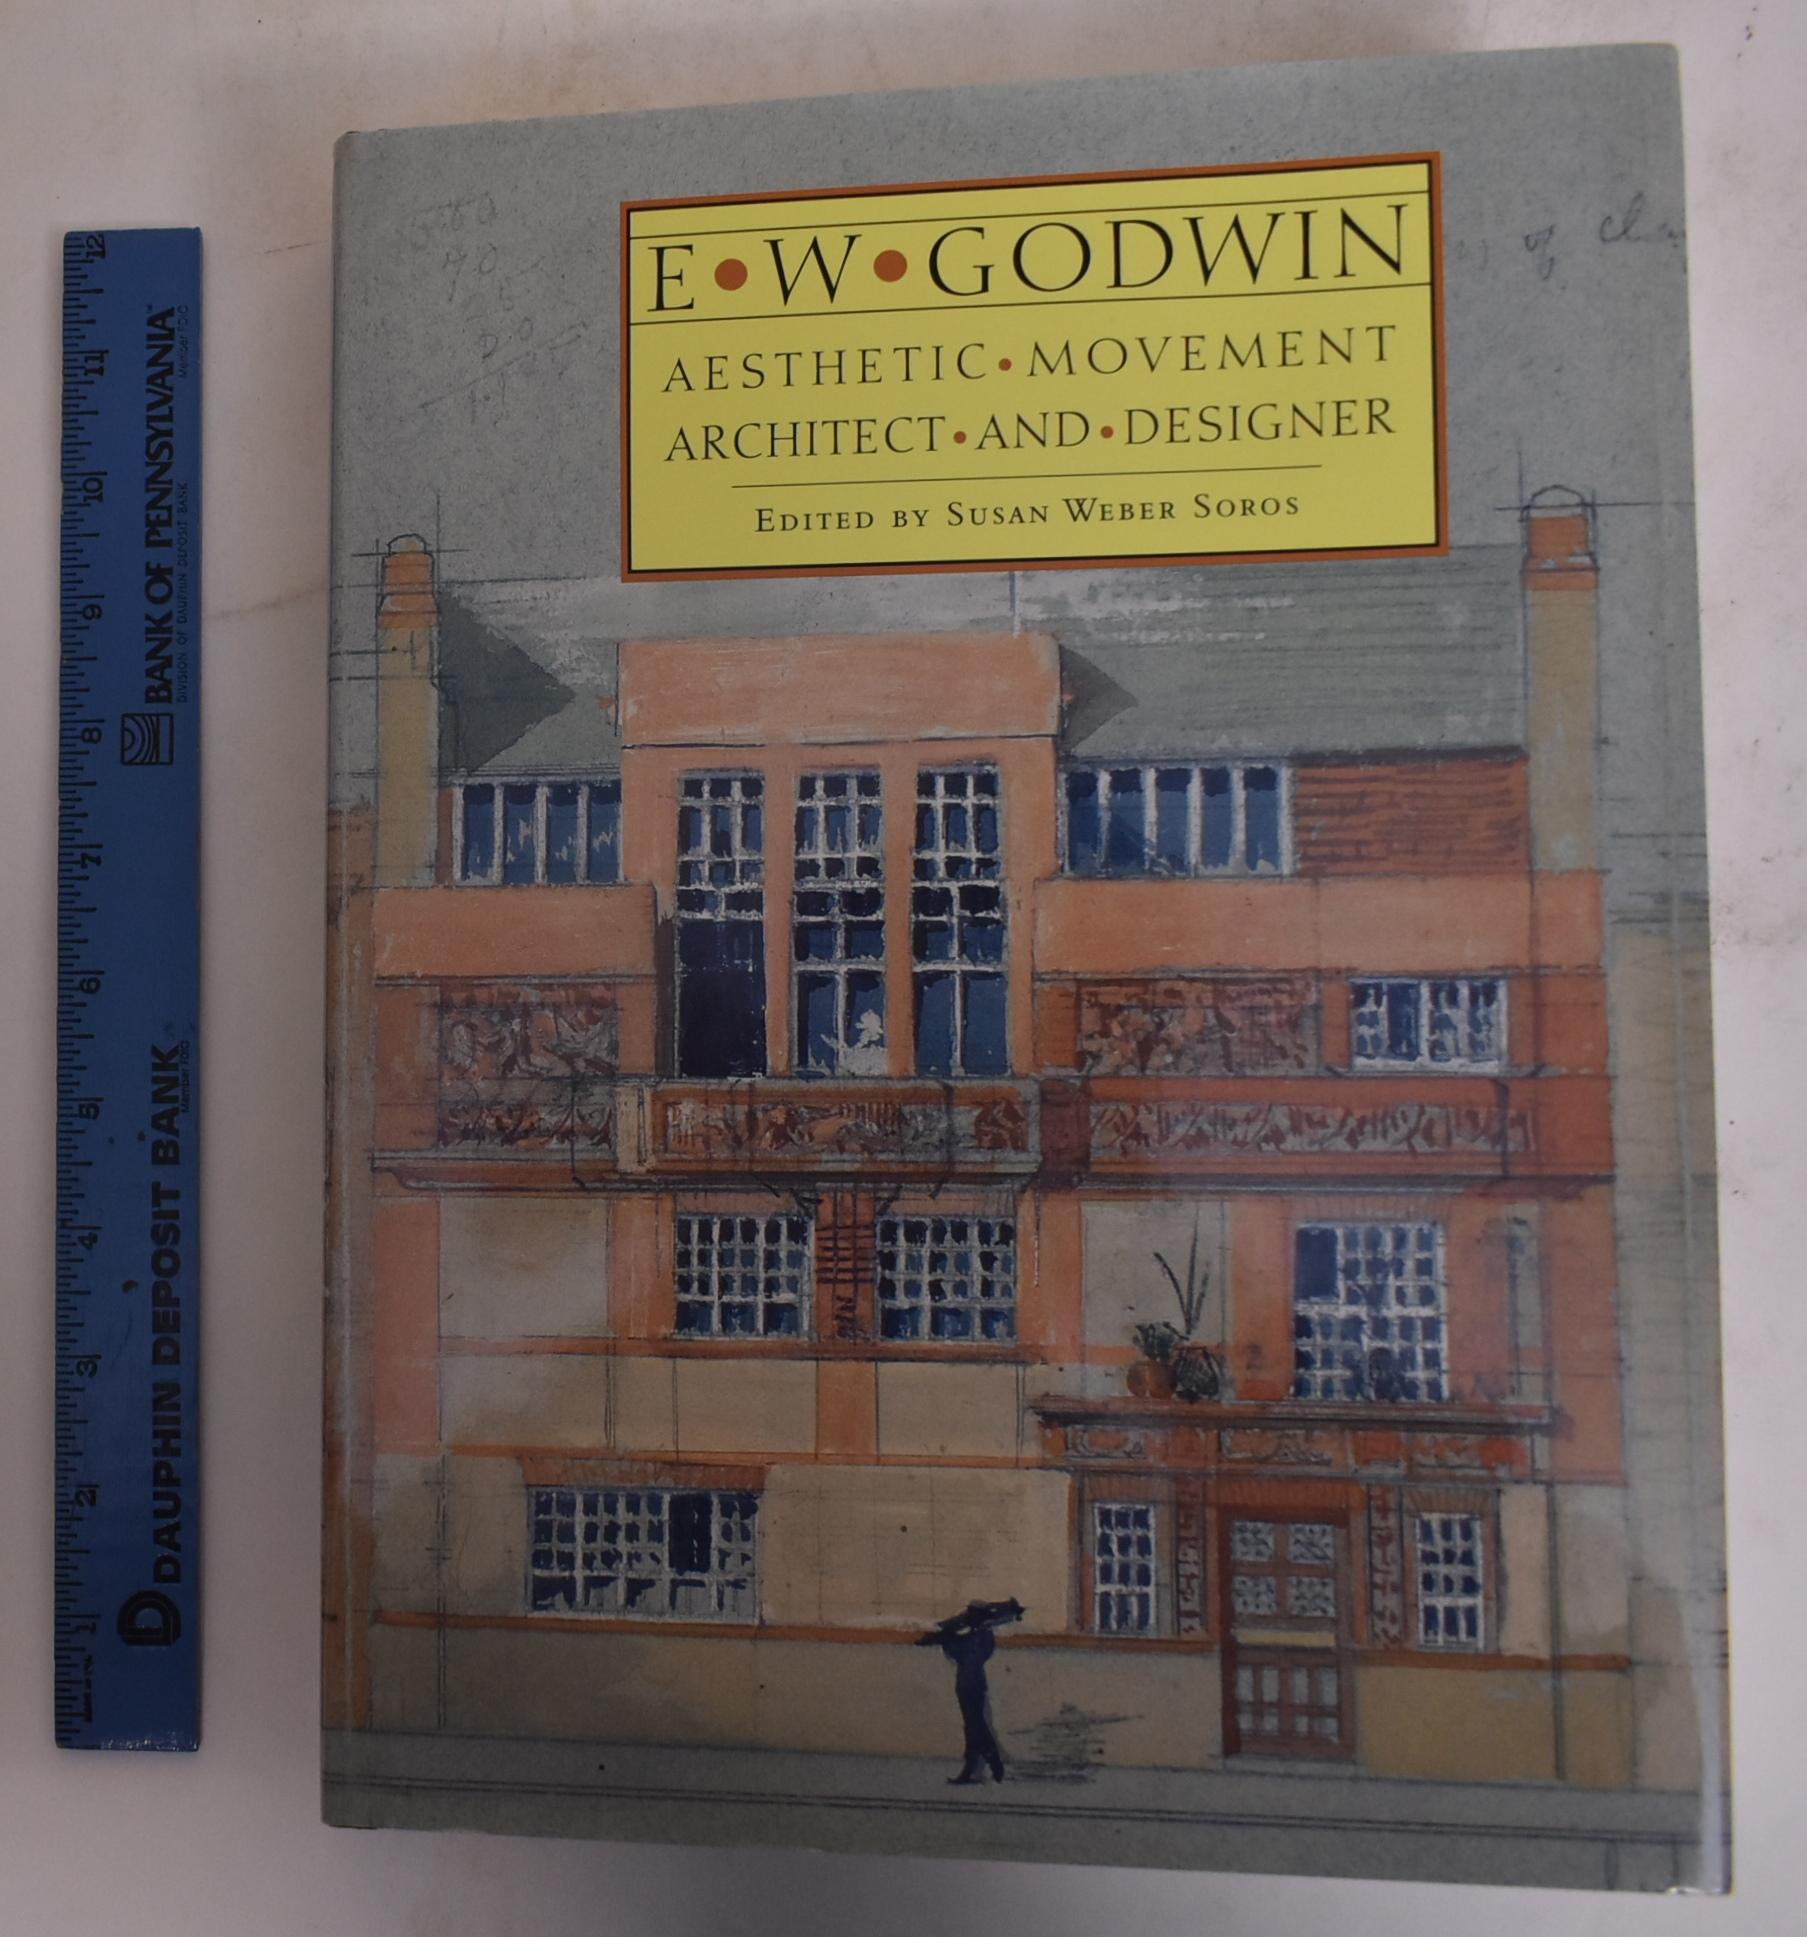 E. W. Godwin: Aesthetic Movement Architect and Designer - Godwin, E.W.; Susan Weber Soros; Catherine Arbuthnott